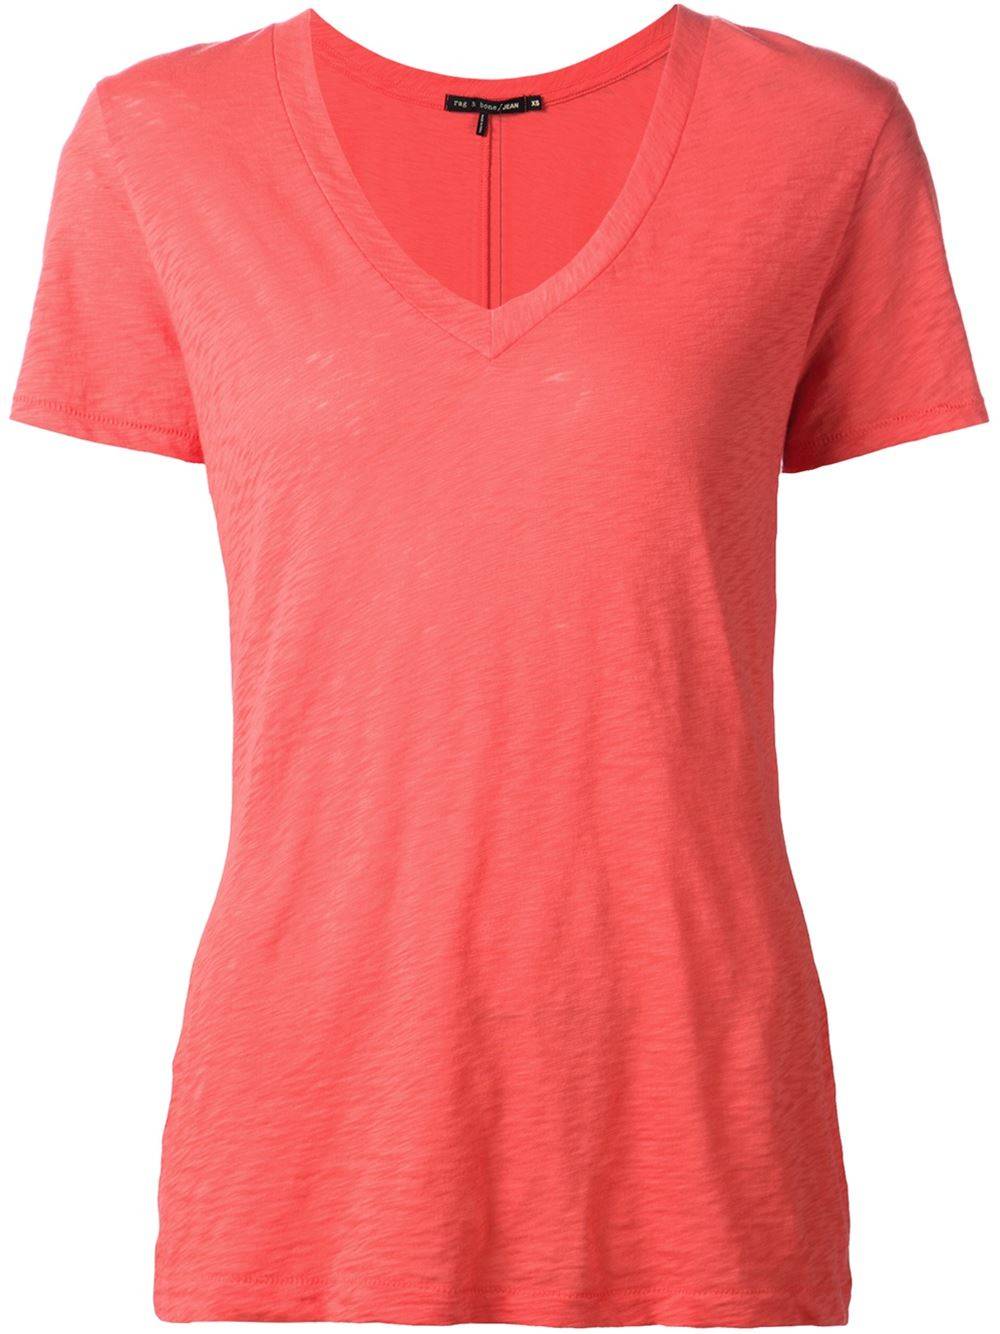 Lyst rag bone classic v neck t shirt in pink for Rag and bone t shirts